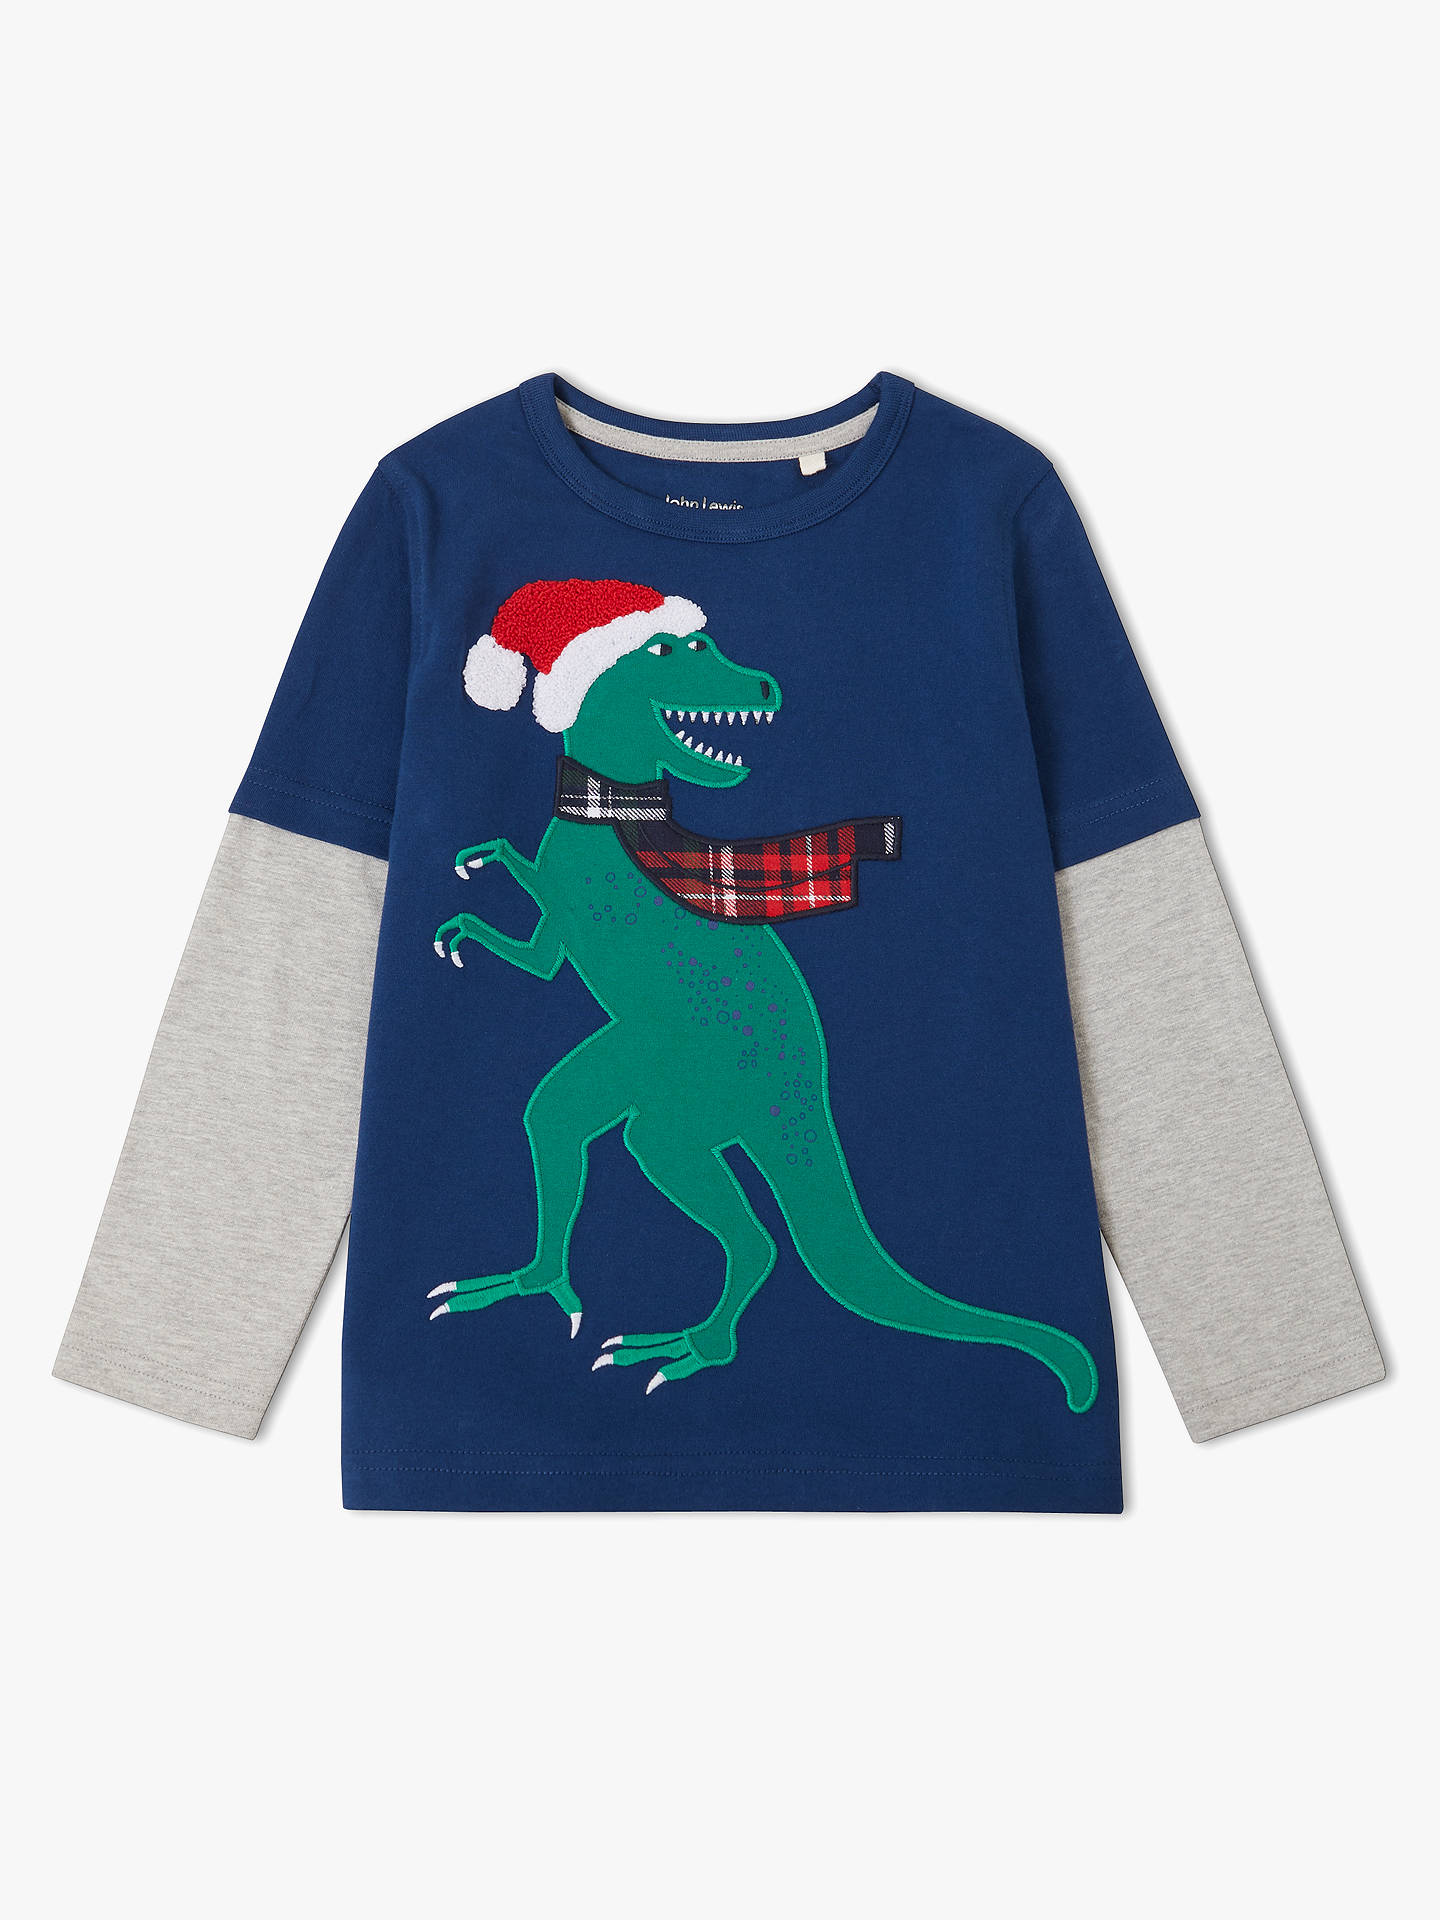 0f3f7e1c9 John Lewis   Partners Boys  Dinosaur Graphic Mock Long Sleeve T ...